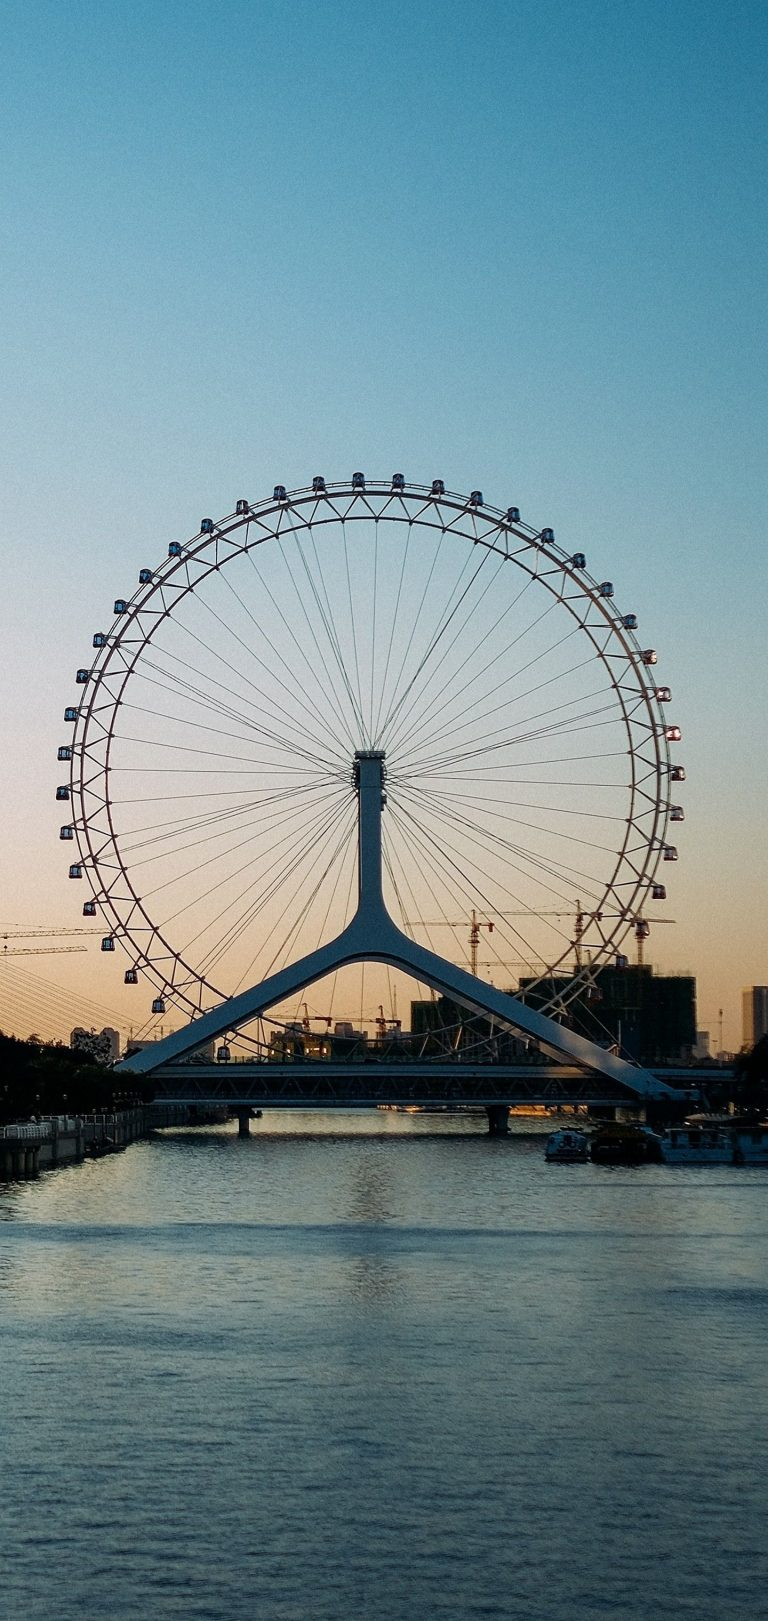 Ferris Wheel City Entertainment Wallpaper 1440x3040 768x1621